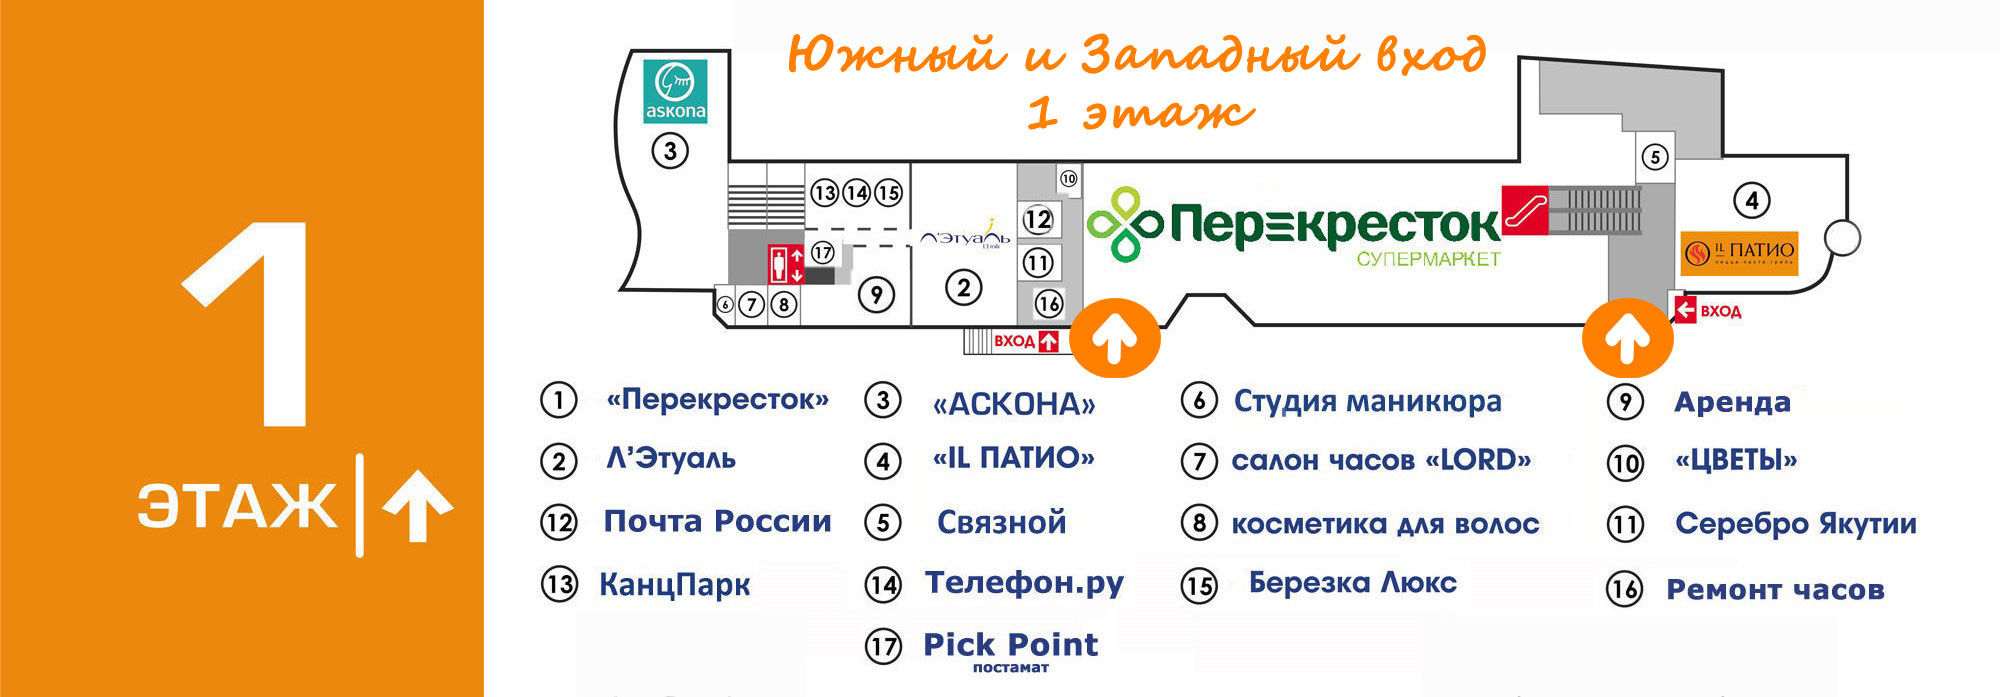 "Супермаркет Перекресток в ТРЦ ""Вертикаль"""